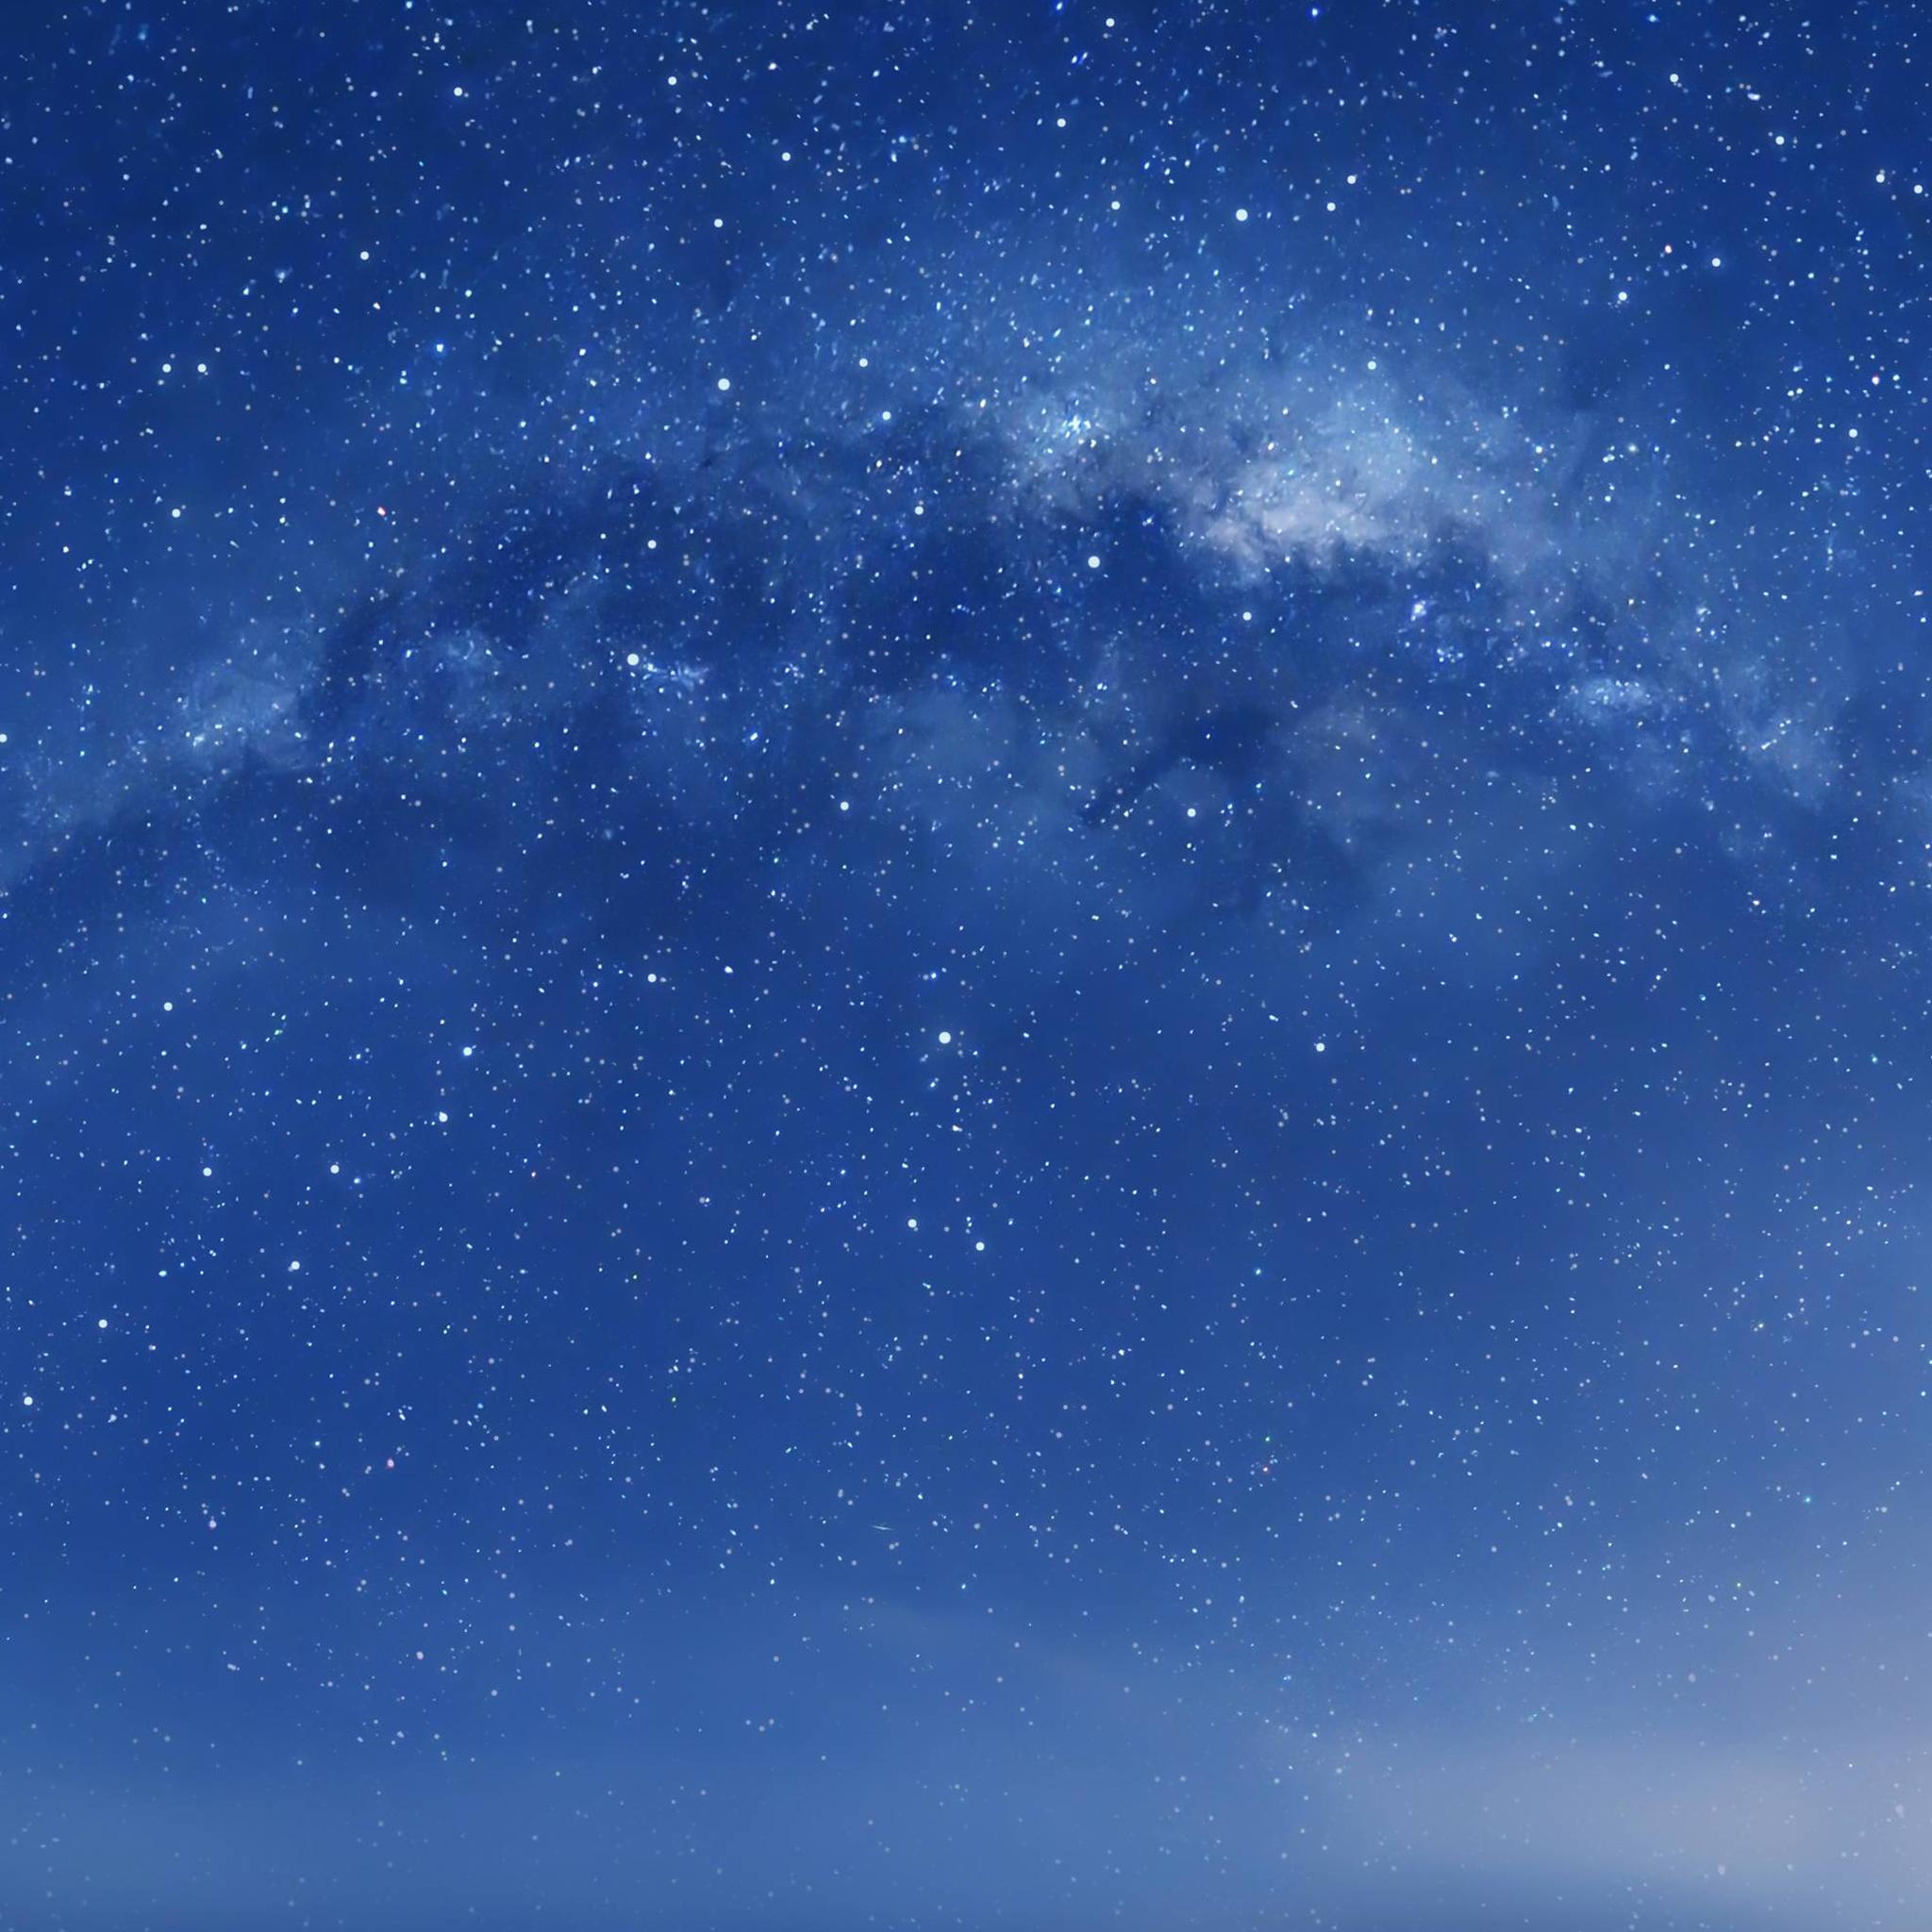 Mac OS X Mountain Lion Sky 3Wallpapers iPad Retina Mac OS X Mountain Lion Sky   iPad Retina